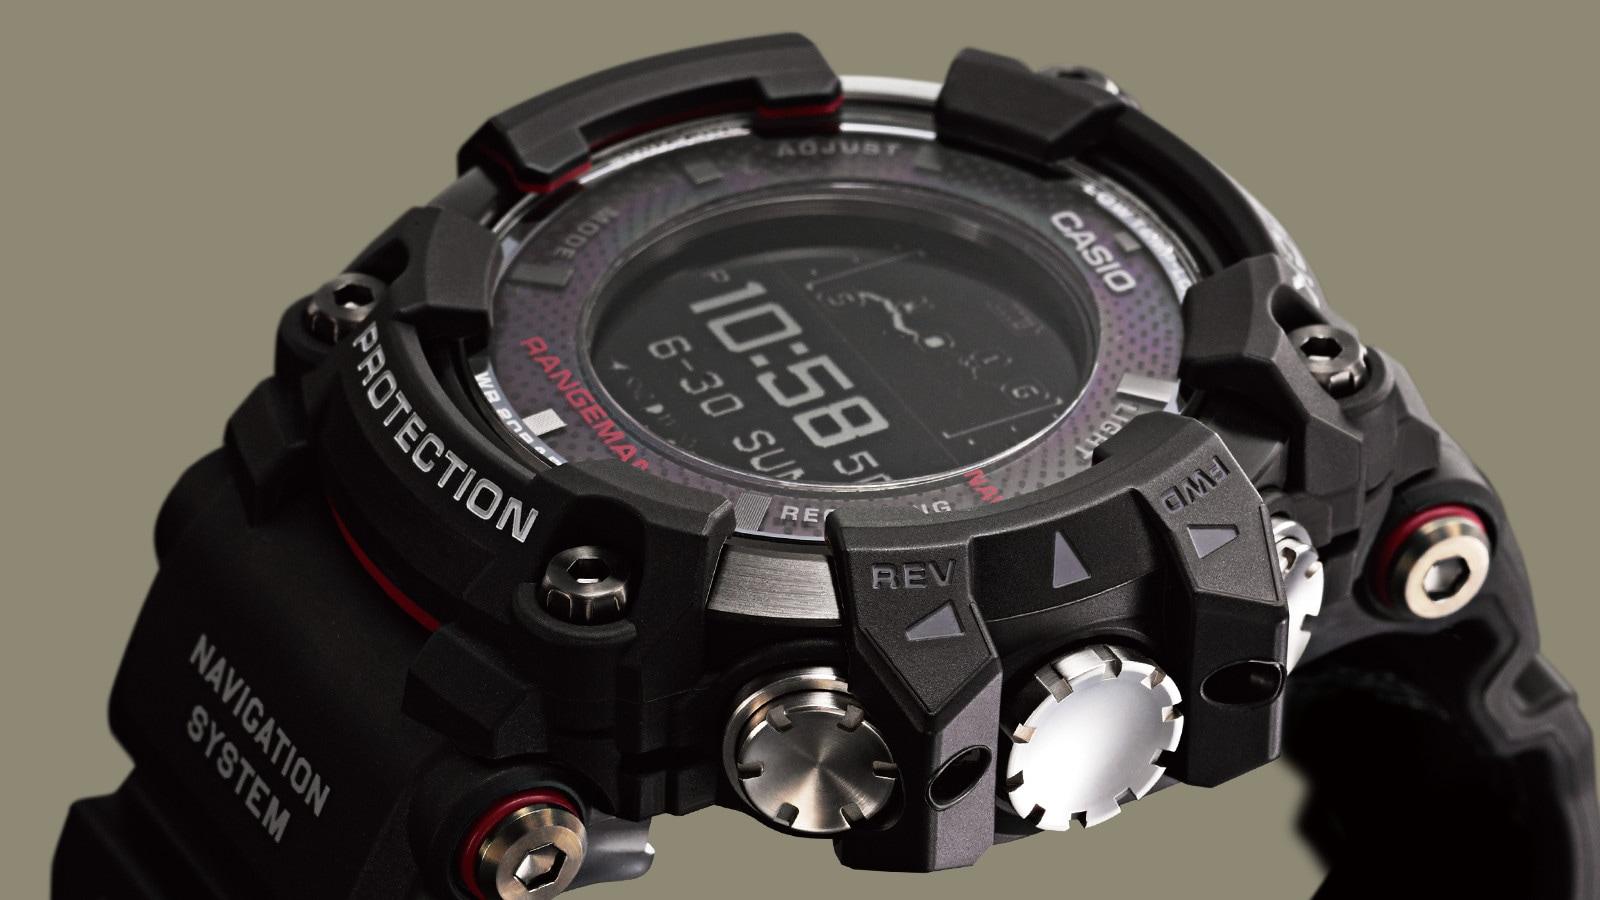 1cb826b30 RANGEMAN - GPR-B1000 - Products - G-SHOCK - CASIO